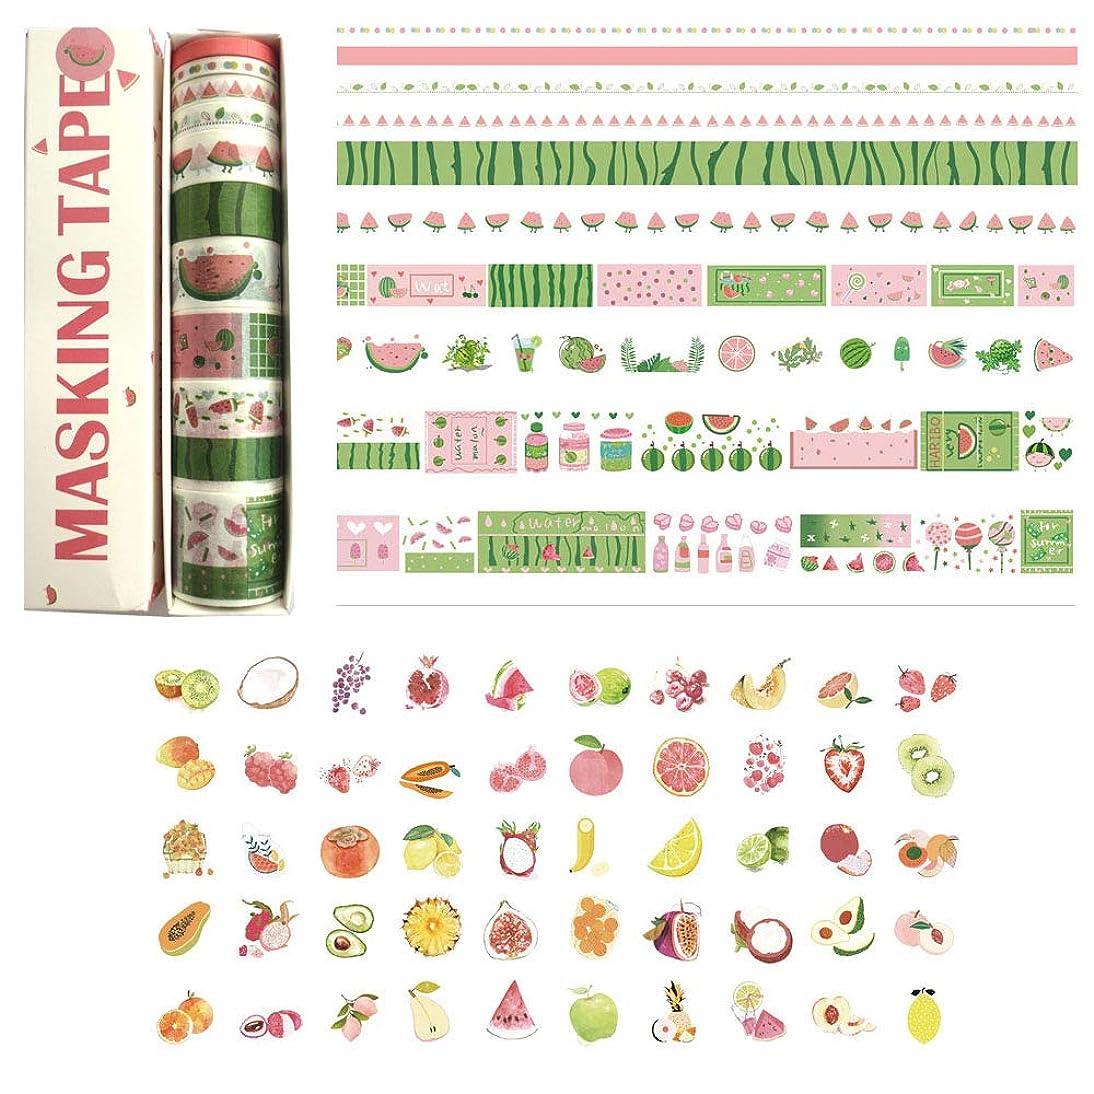 DzdzCrafts 10 Rolls Watermelon Food Story Decorative Washi Tapes Set and 6 Sheets 300+ Stickers (0.5cm 0.8cm 1.5cm 2cm 3cm Wide x 2M) lhpb686693293823